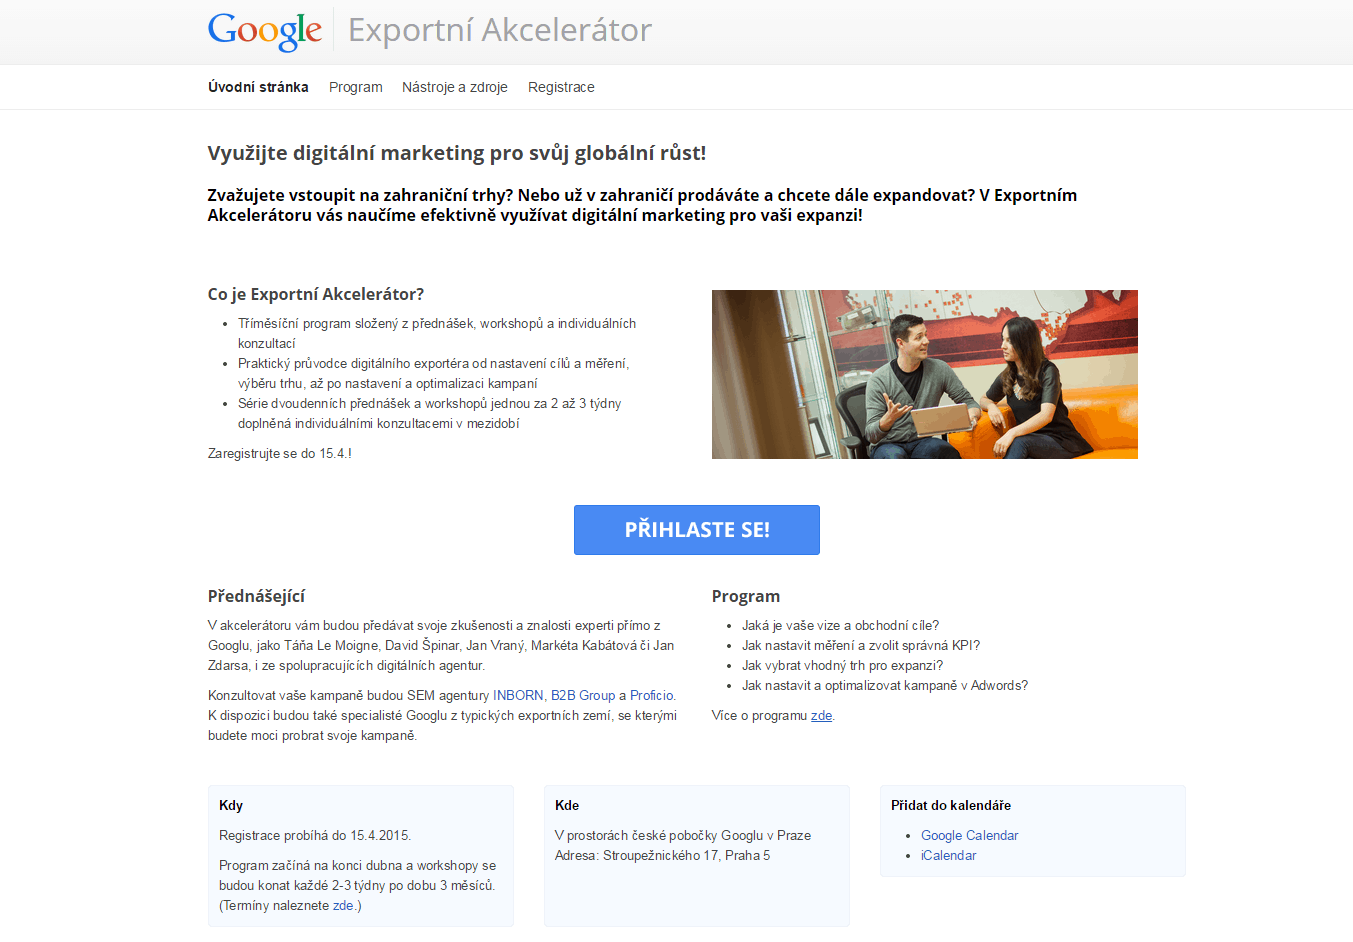 Exportni akcelerator Google